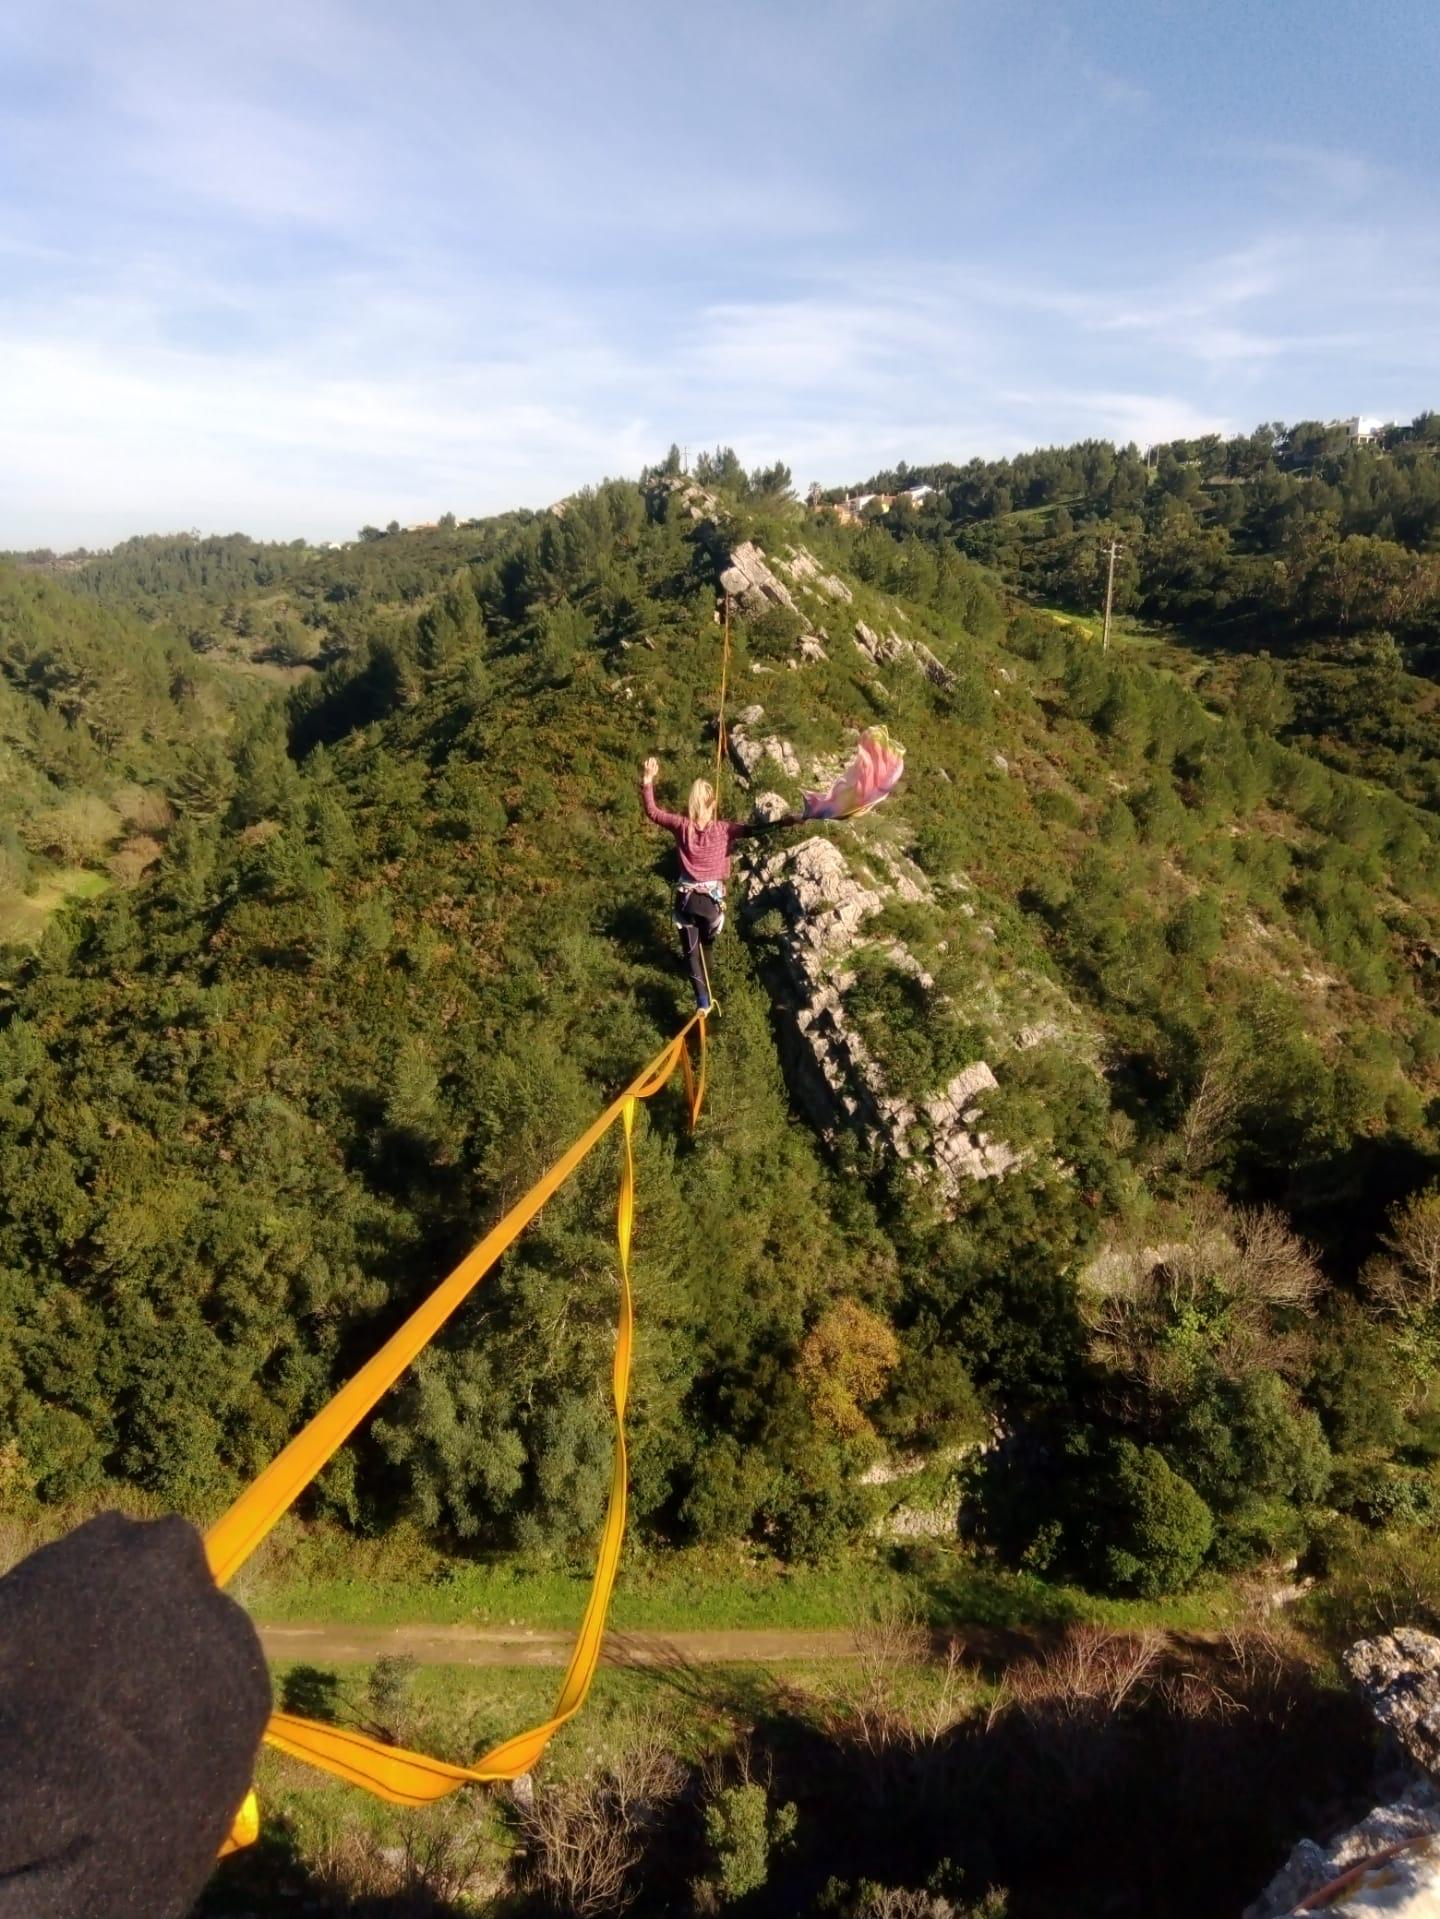 Highline-Trip Portugal: Immer fast am fliegen